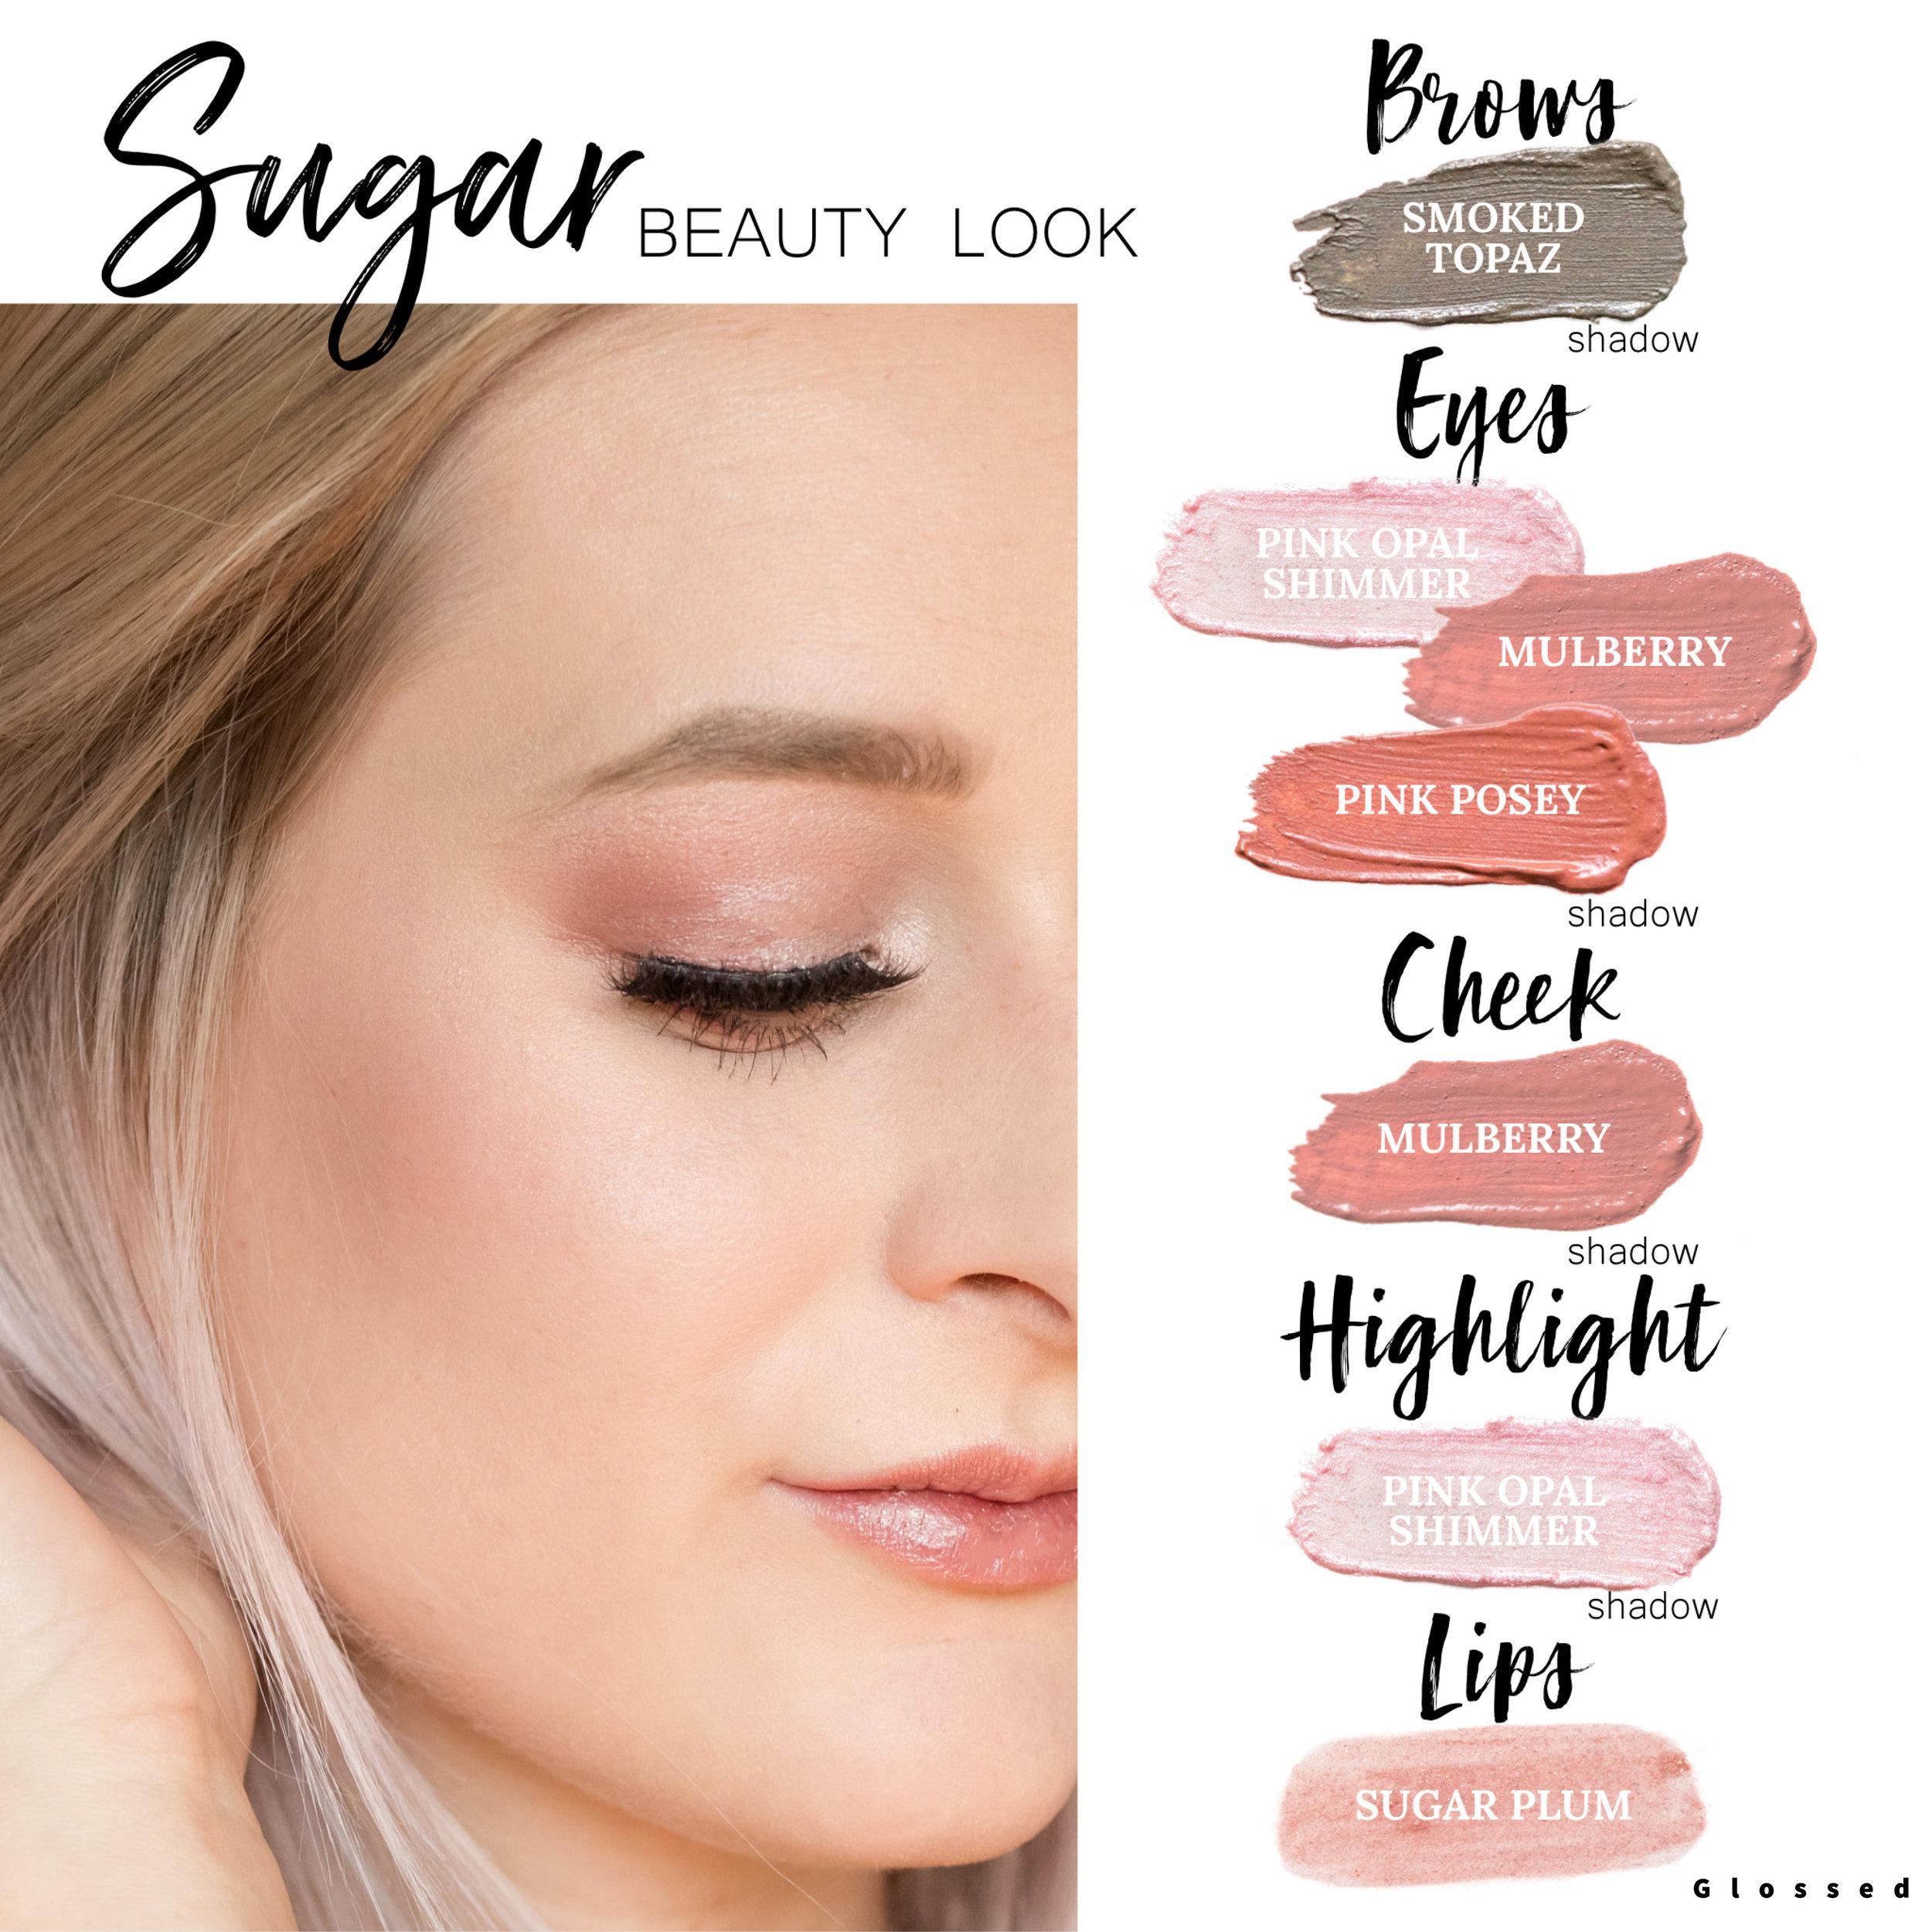 Sugar Beauty Look 2.jpg